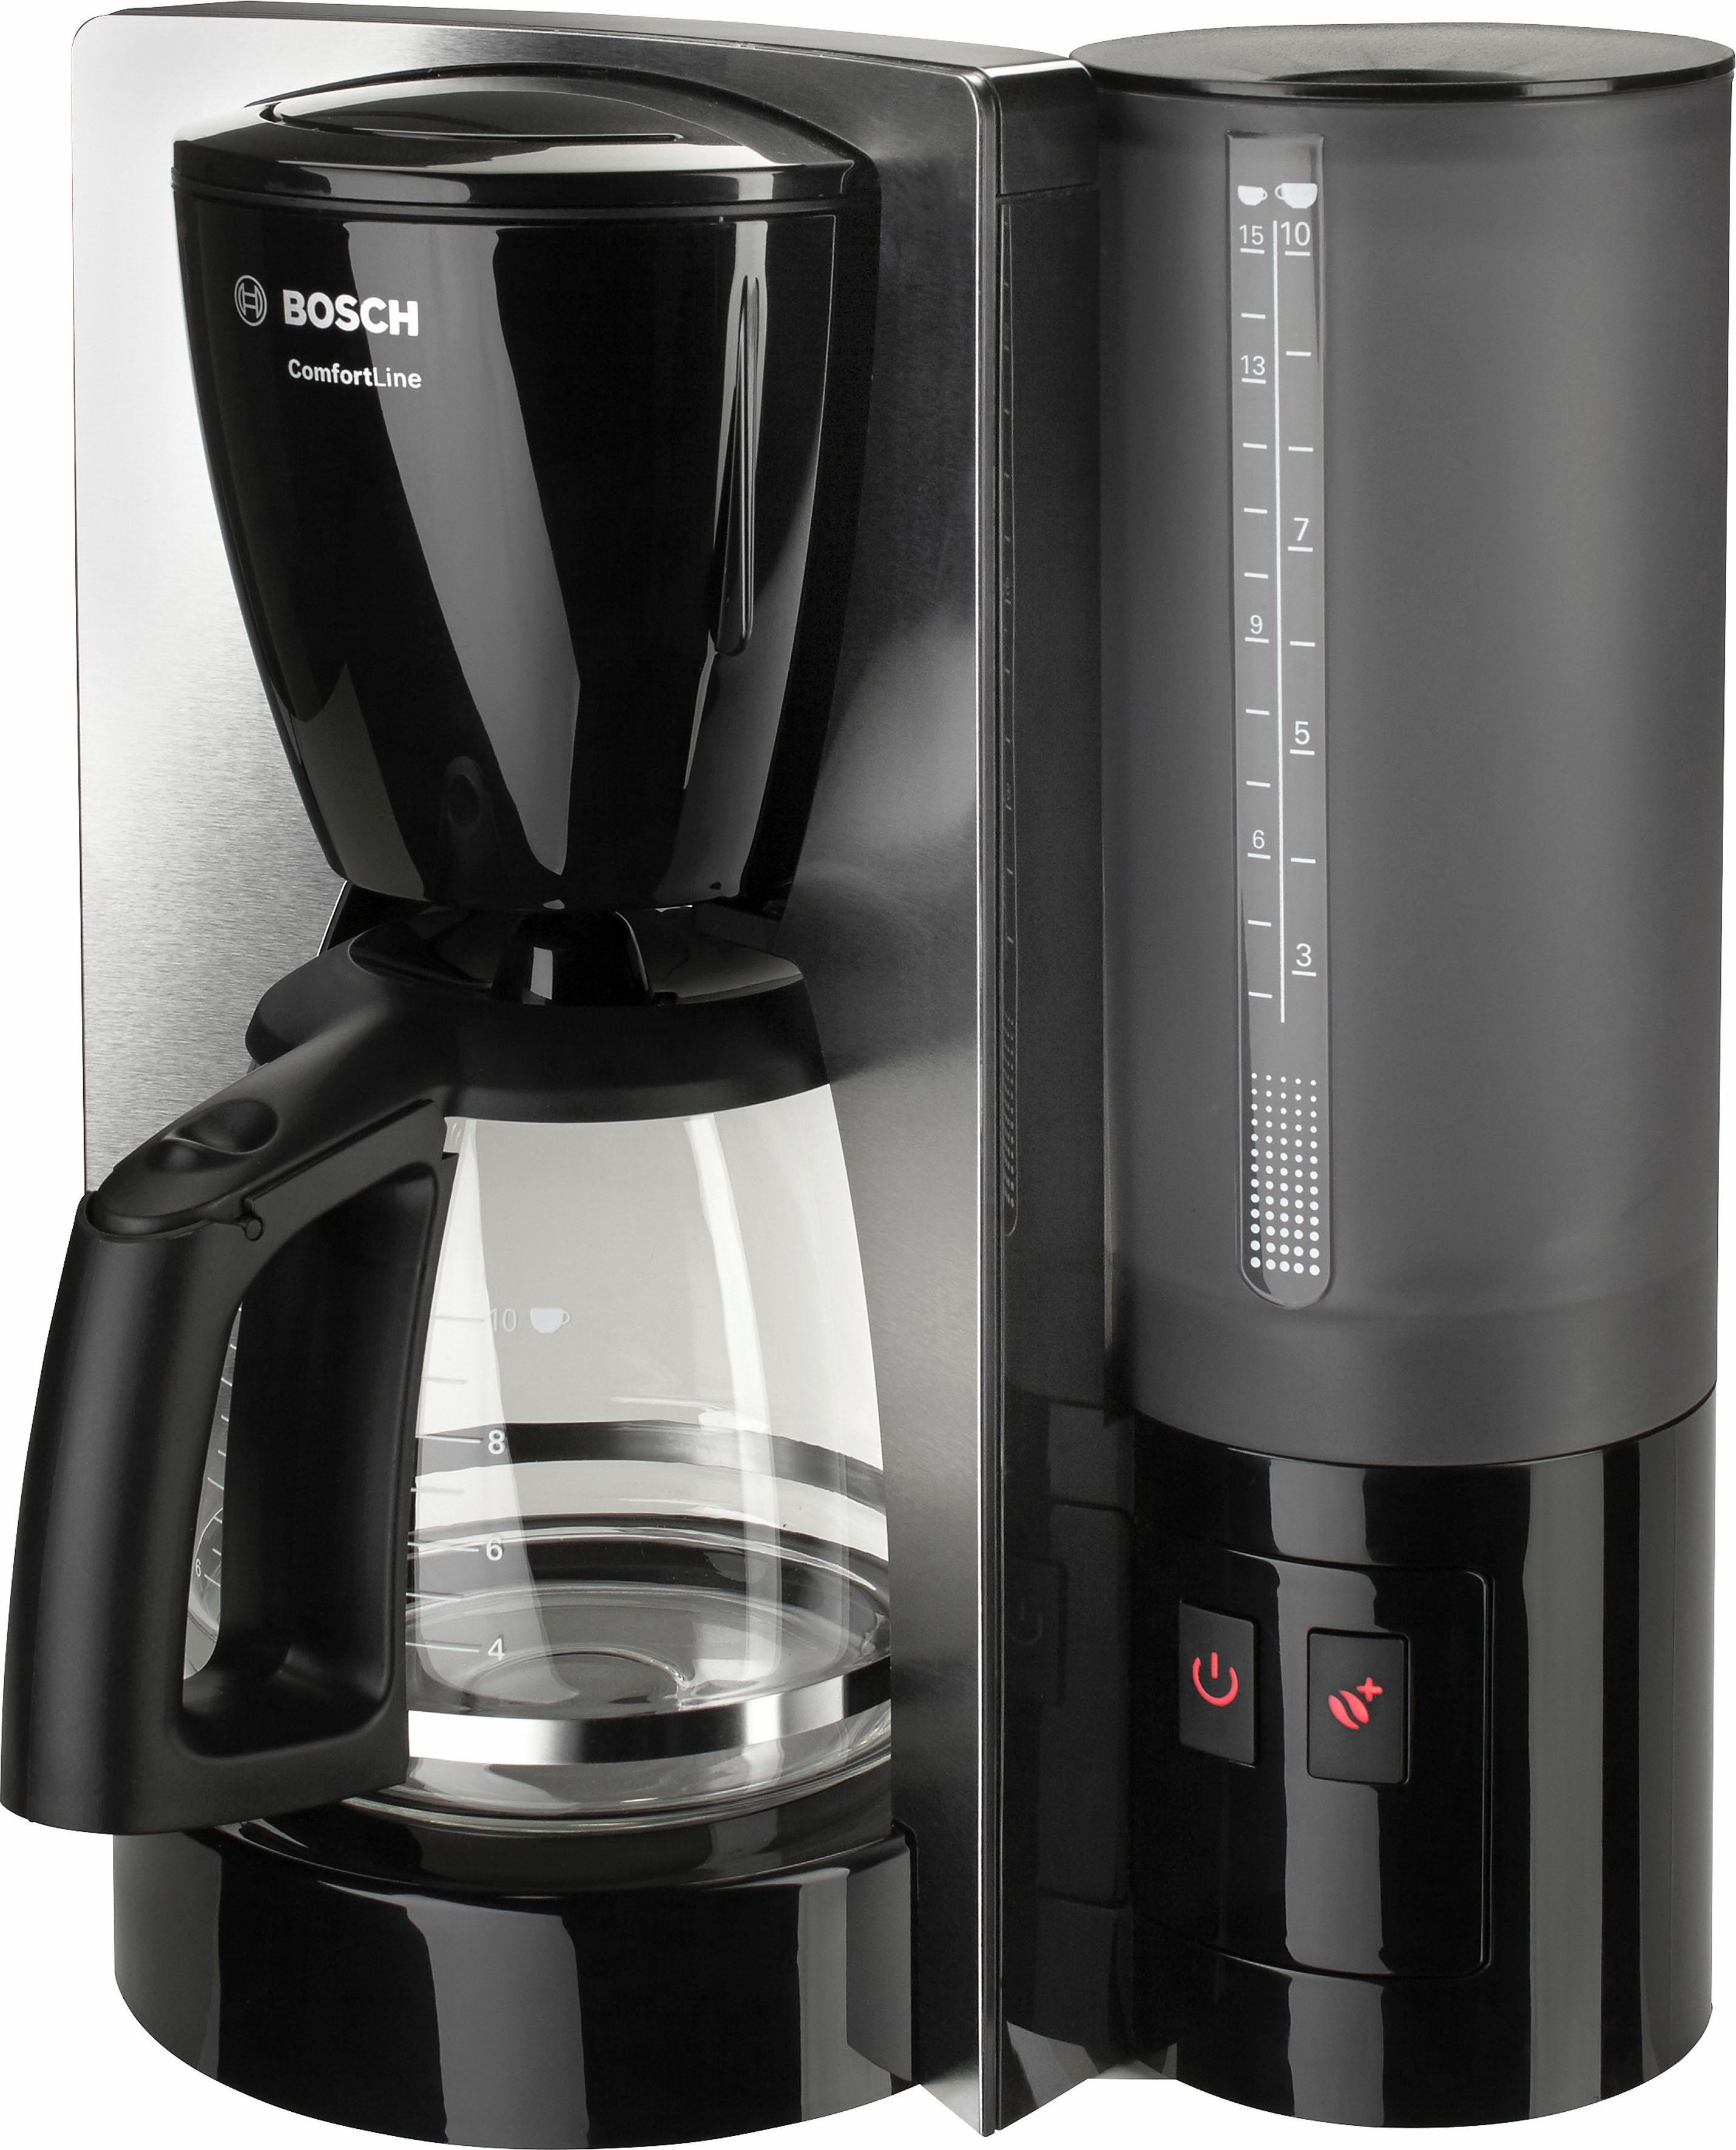 BOSCH filterkoffieapparaat ComfortLine TKA6A643, 1,25 l nu online kopen bij OTTO